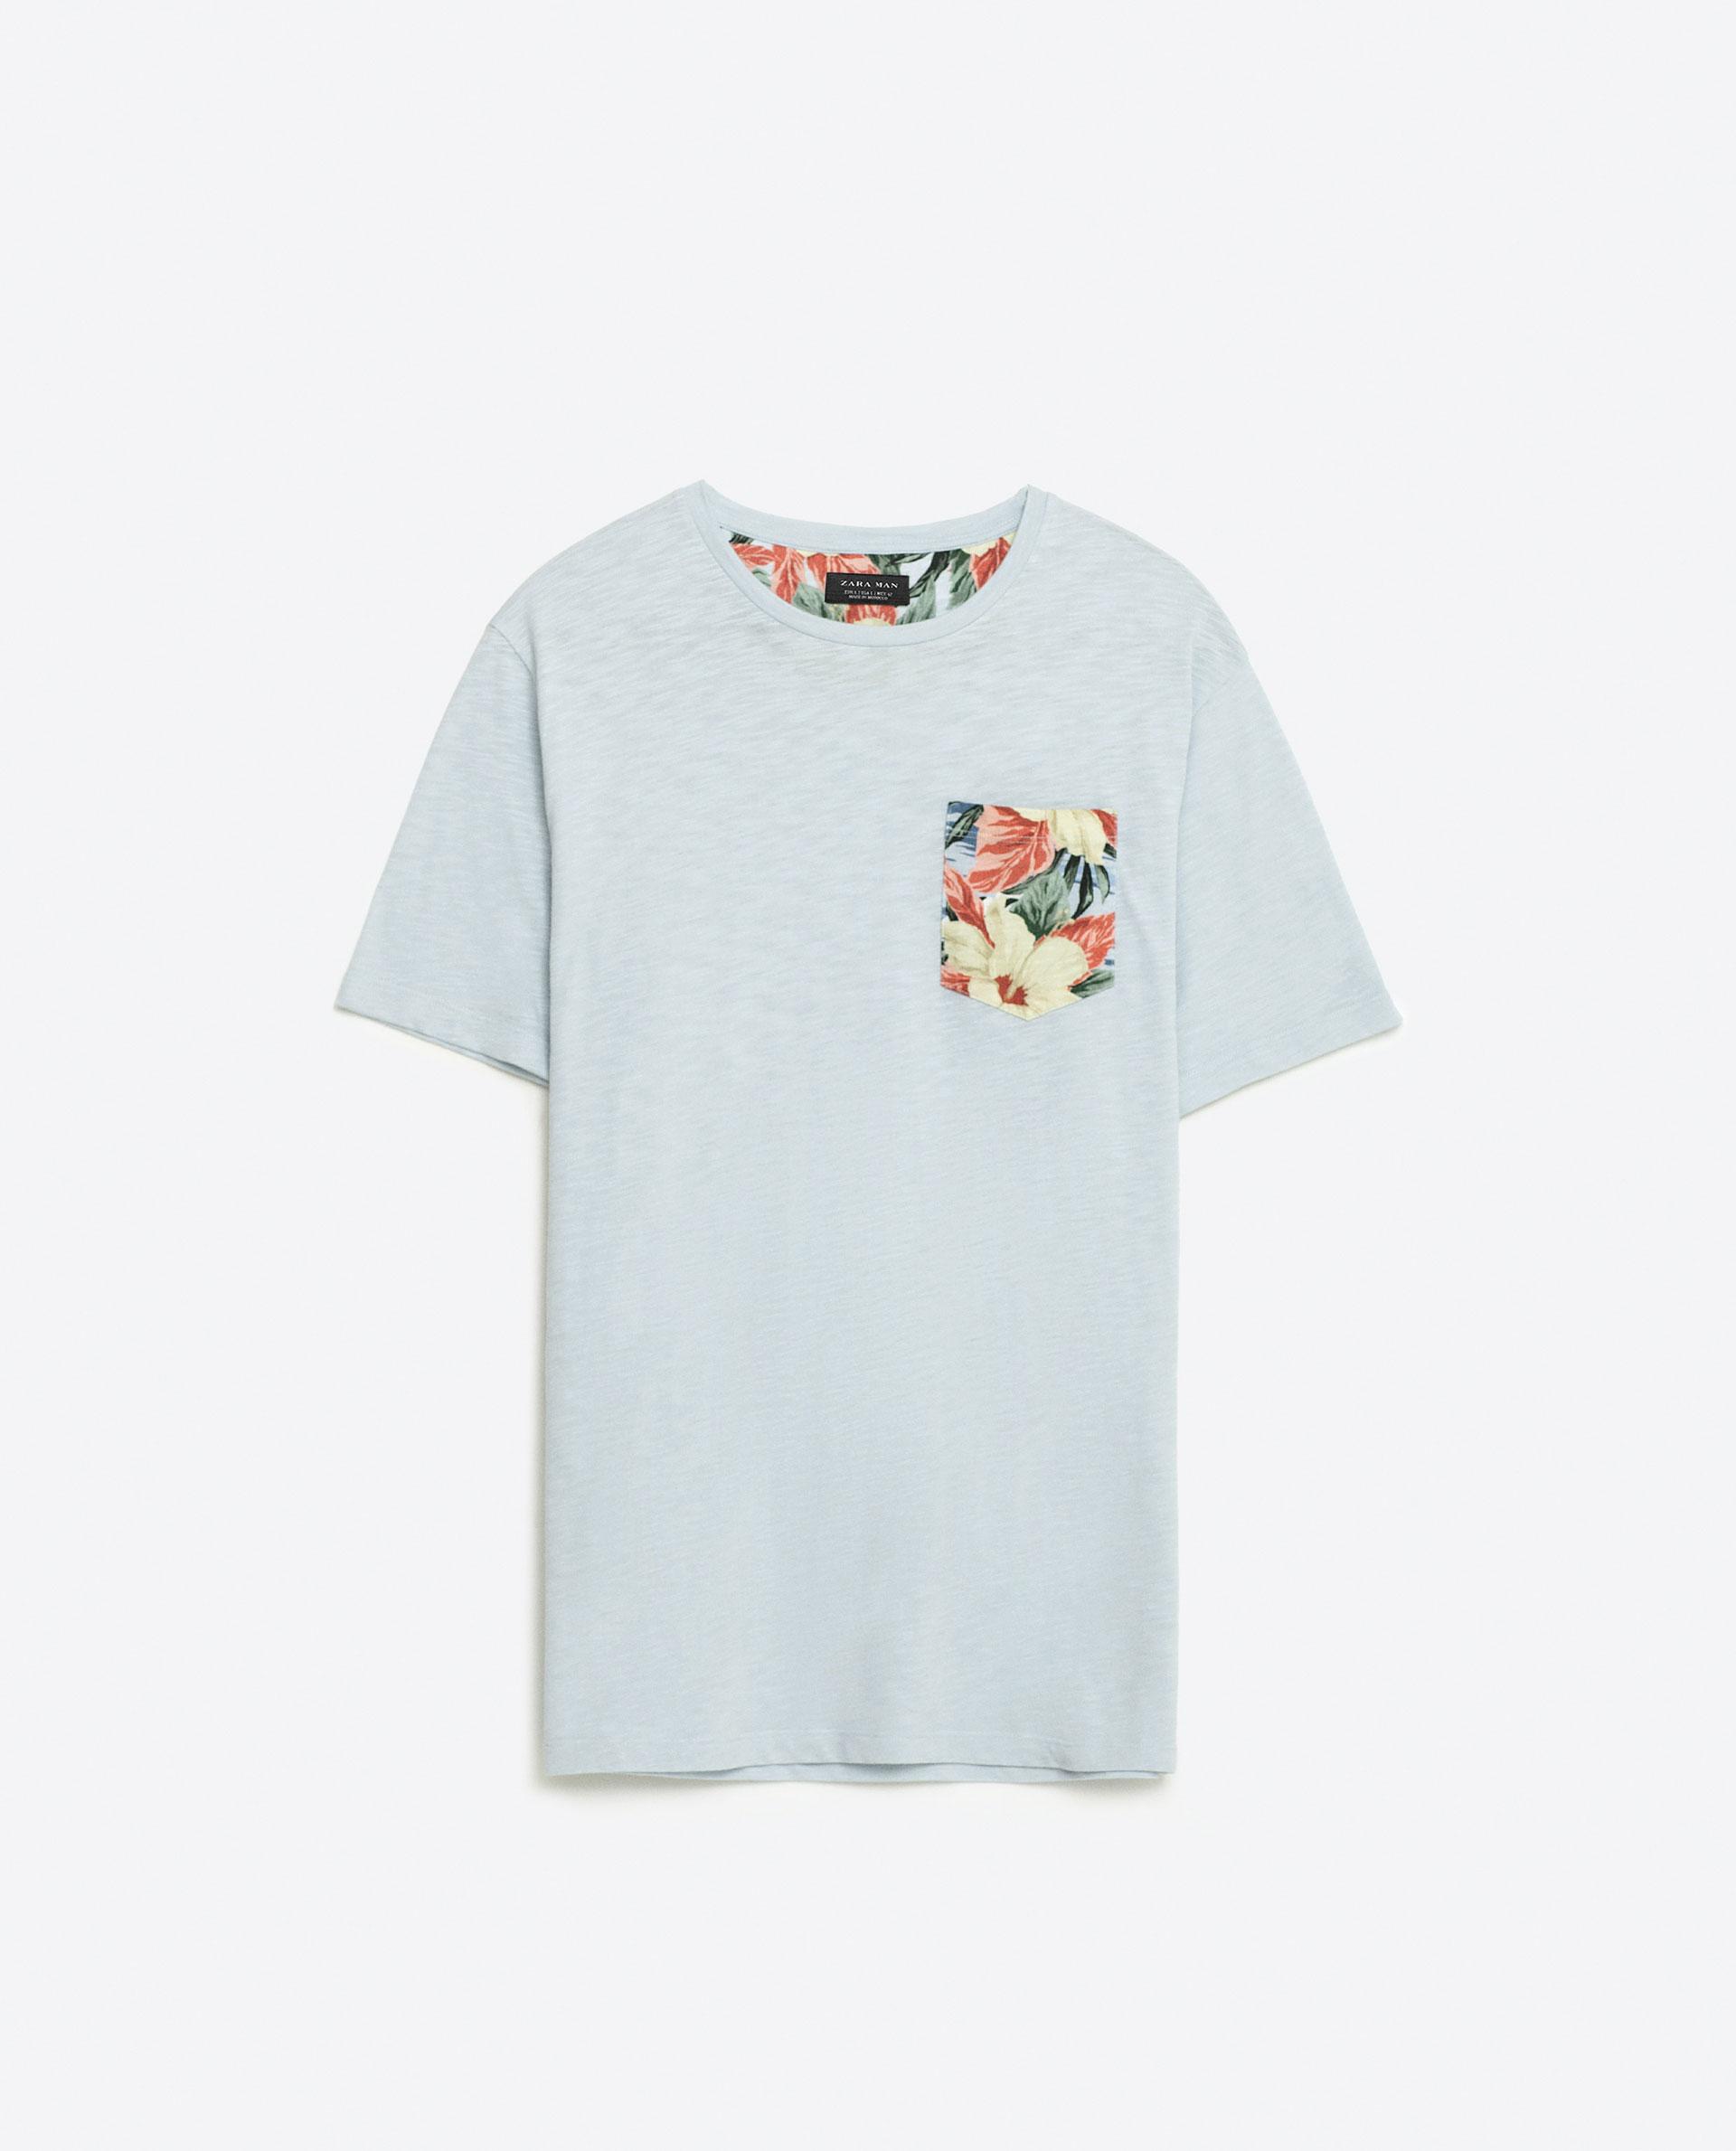 Zara hawaiian floral print t shirt in blue for men lyst for Zara mens floral shirt